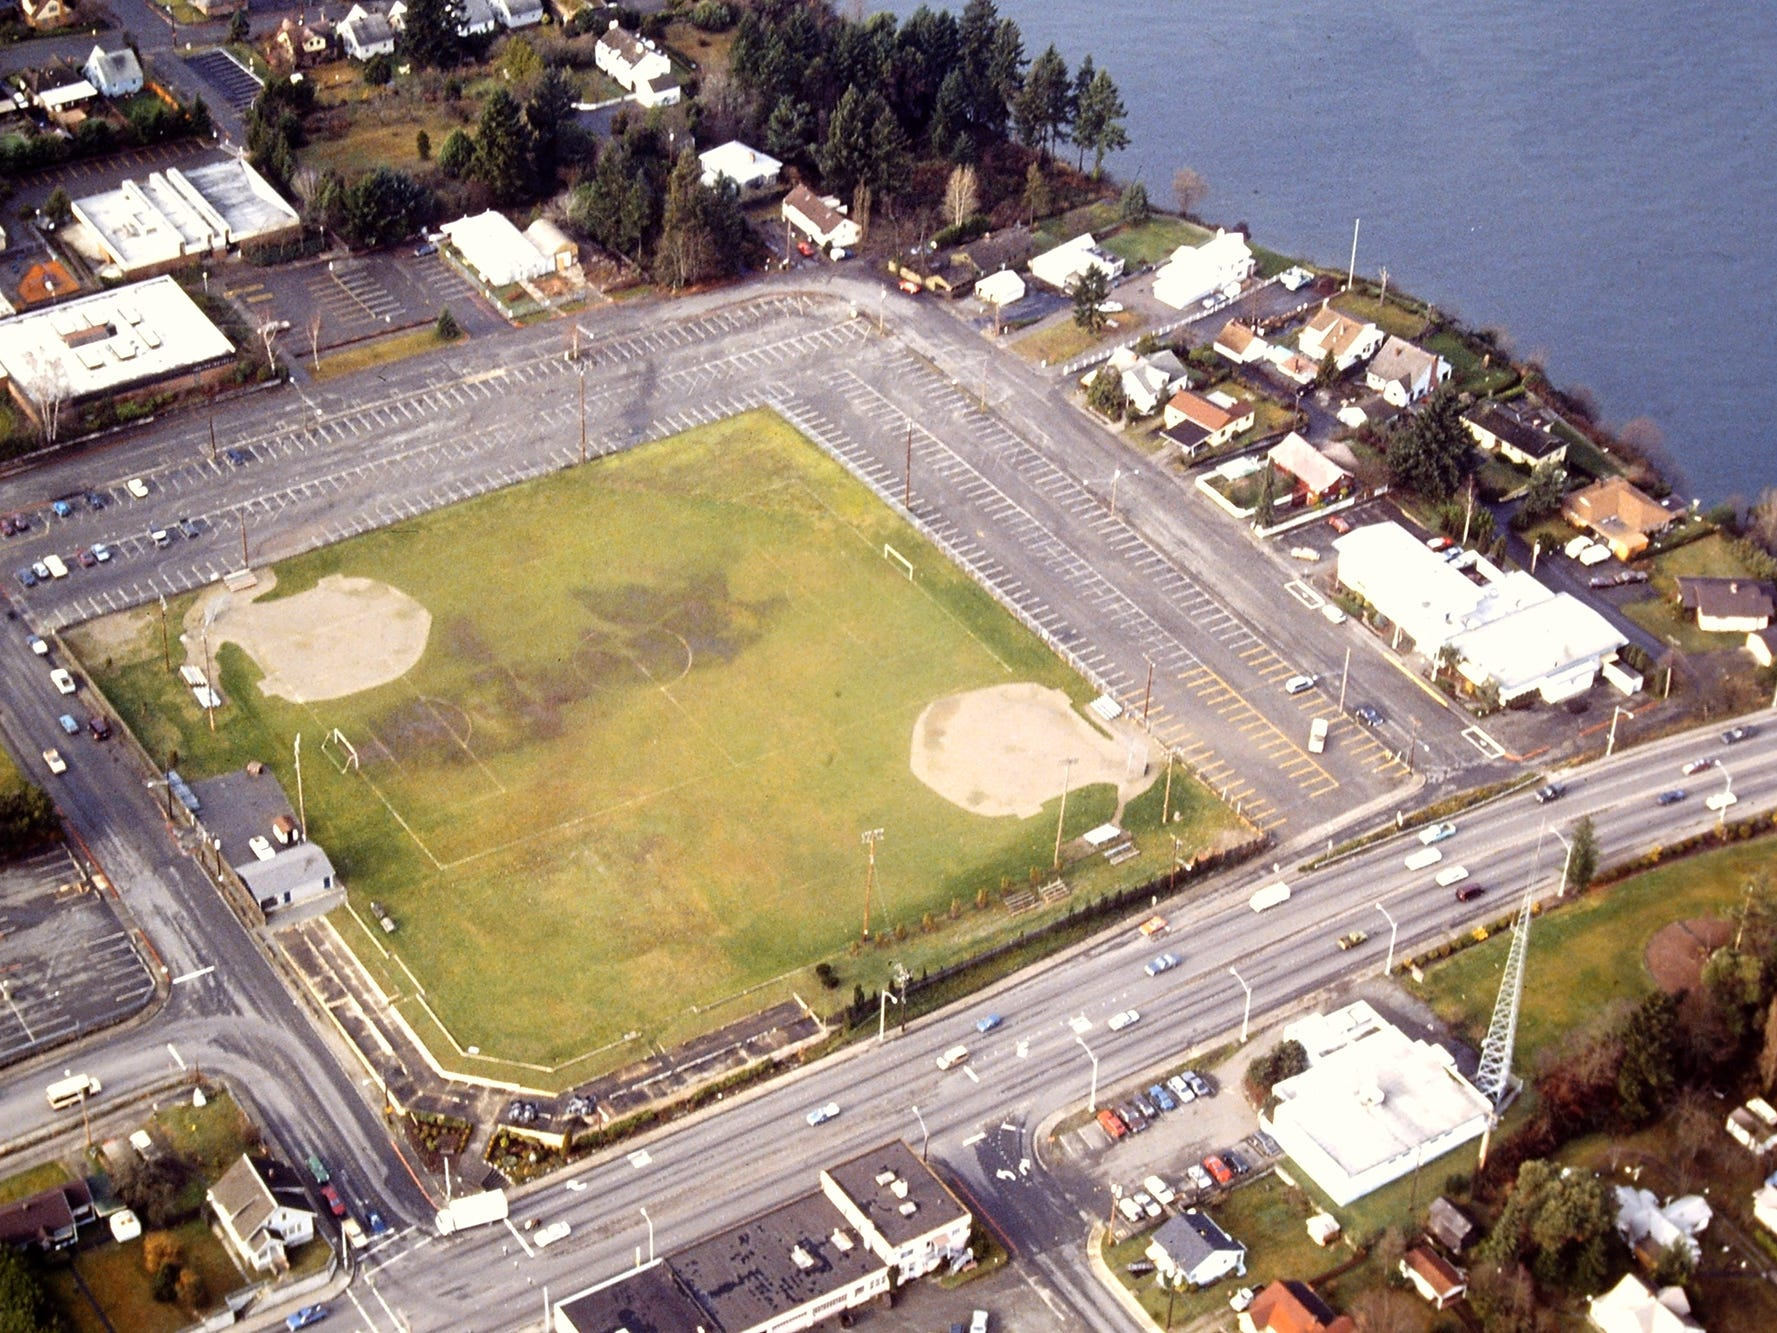 01/01/92Aerials - Roosevelt Field